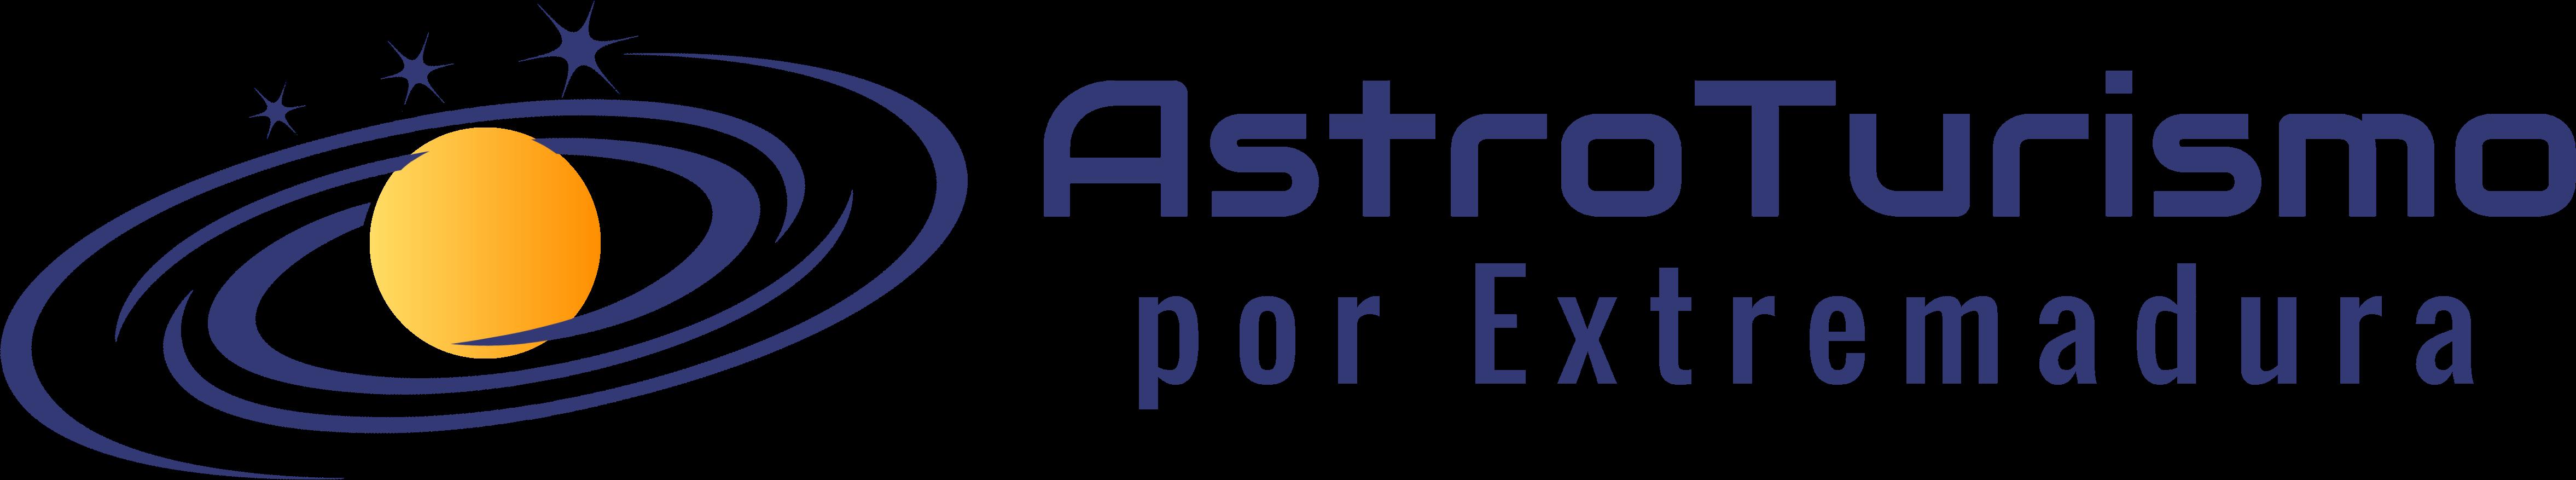 Astroturismo por Extremadura